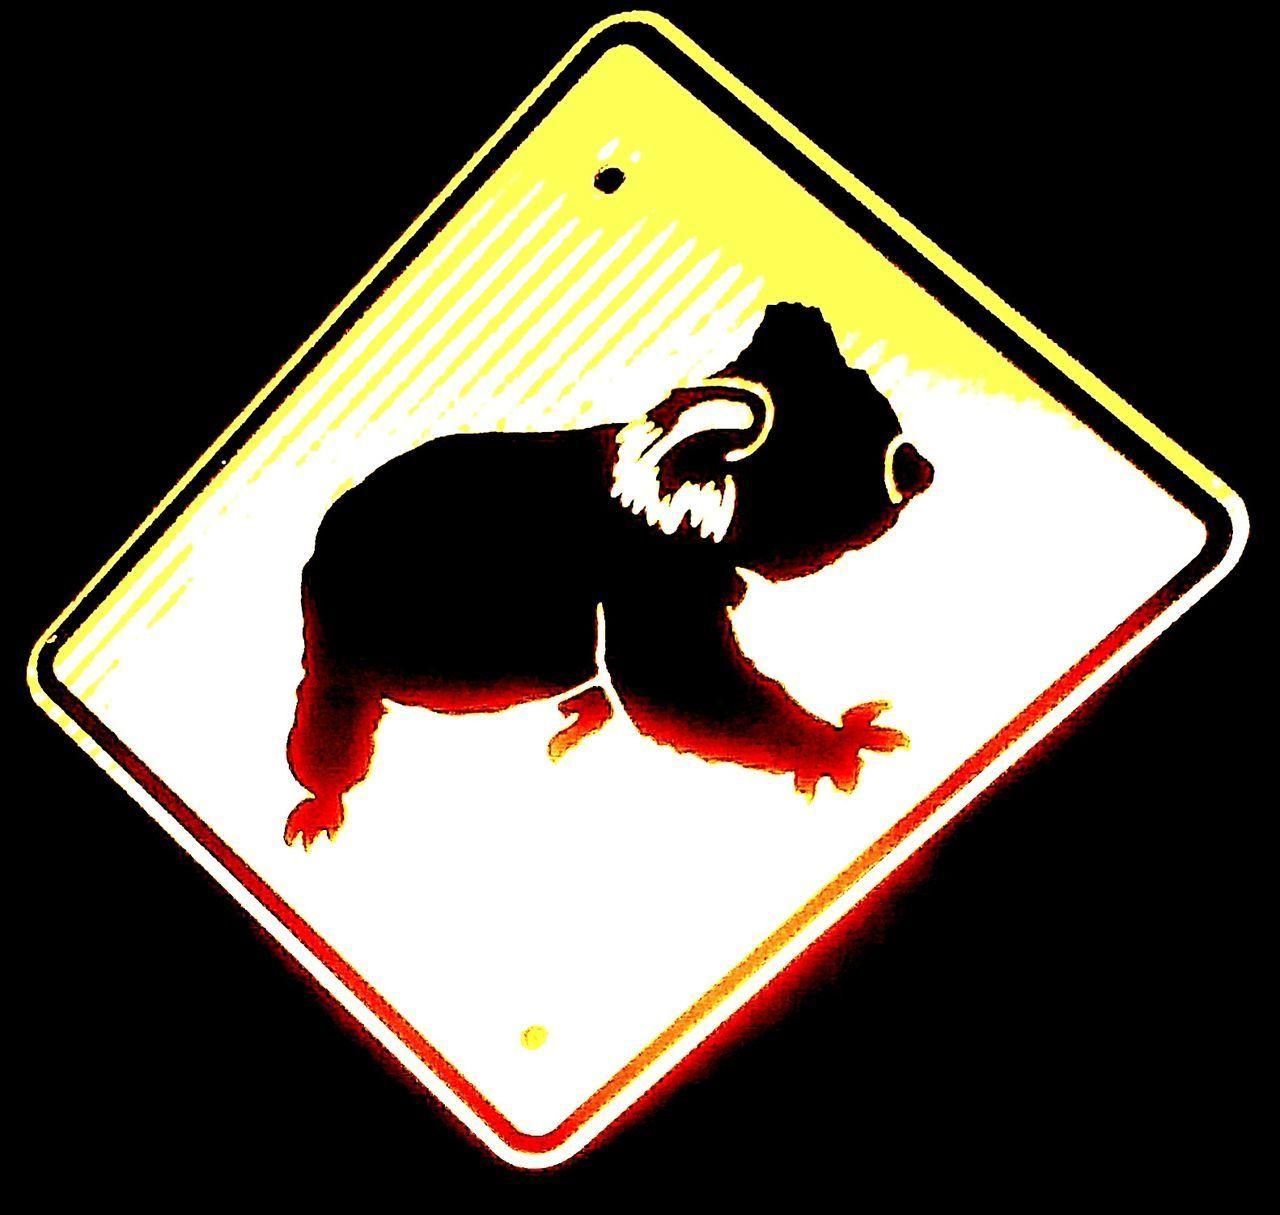 Koala Illuminated Signs Signage Signs Fauna Koala 🐨 Koalas KO_A_LA Ko A La Warning Sign Road Sign Animals Koala Bear Koalabear Caution Sign Roadsign Sign Signs_collection Signporn Signstalkers Sign Hunters SignHunters Signhunter SIGN. Signs & More Signs